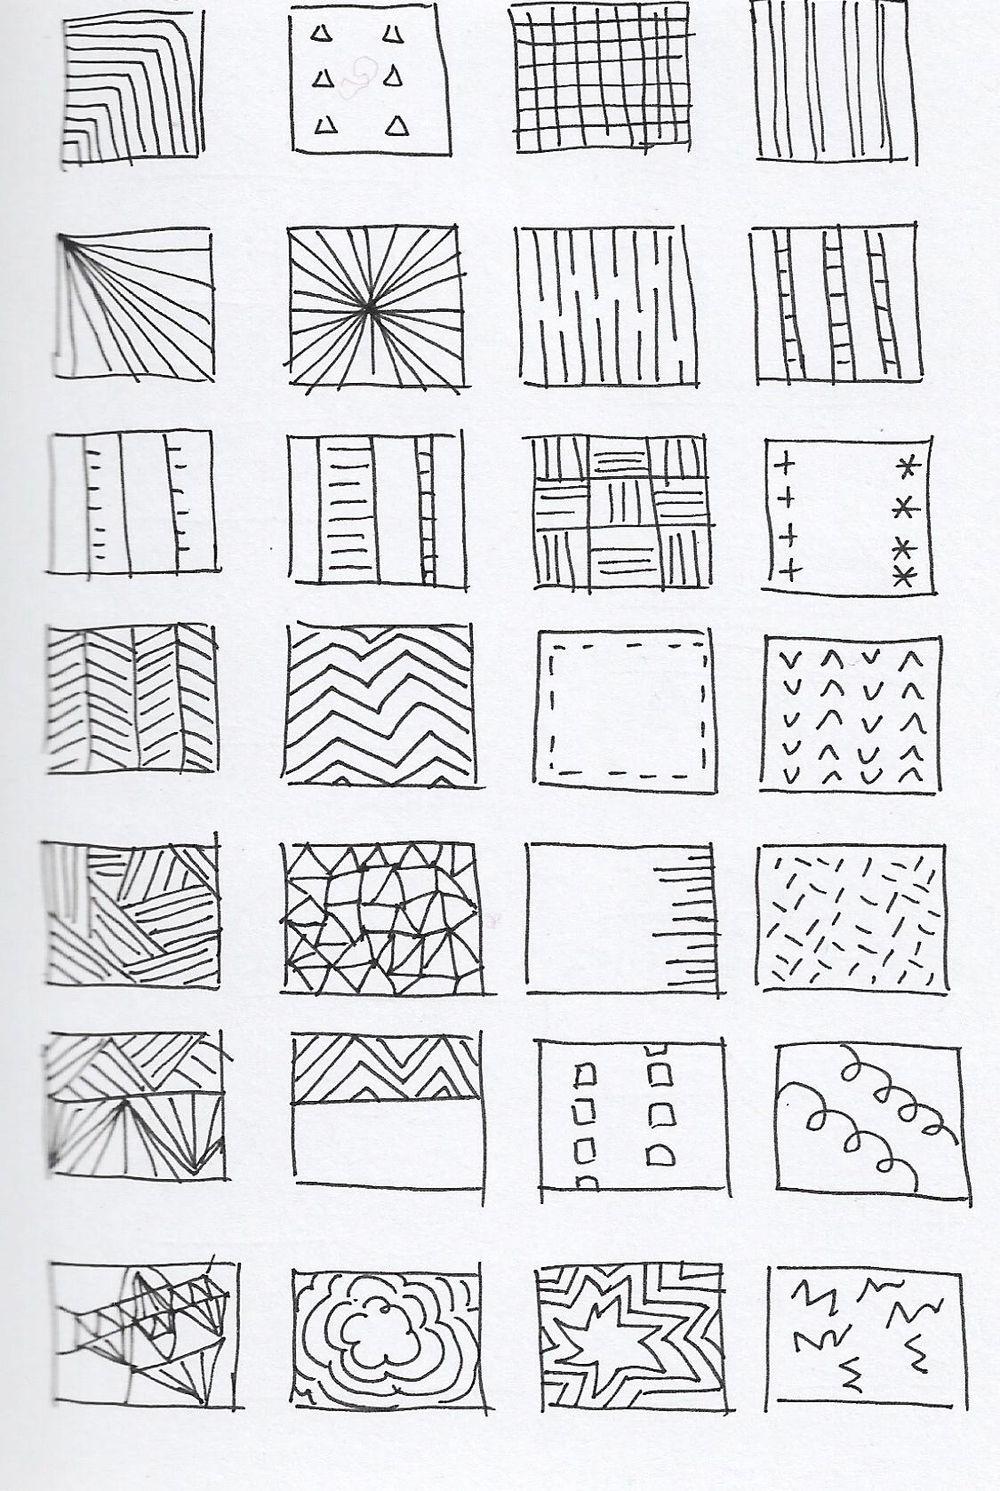 Favela Doodle - image 1 - student project